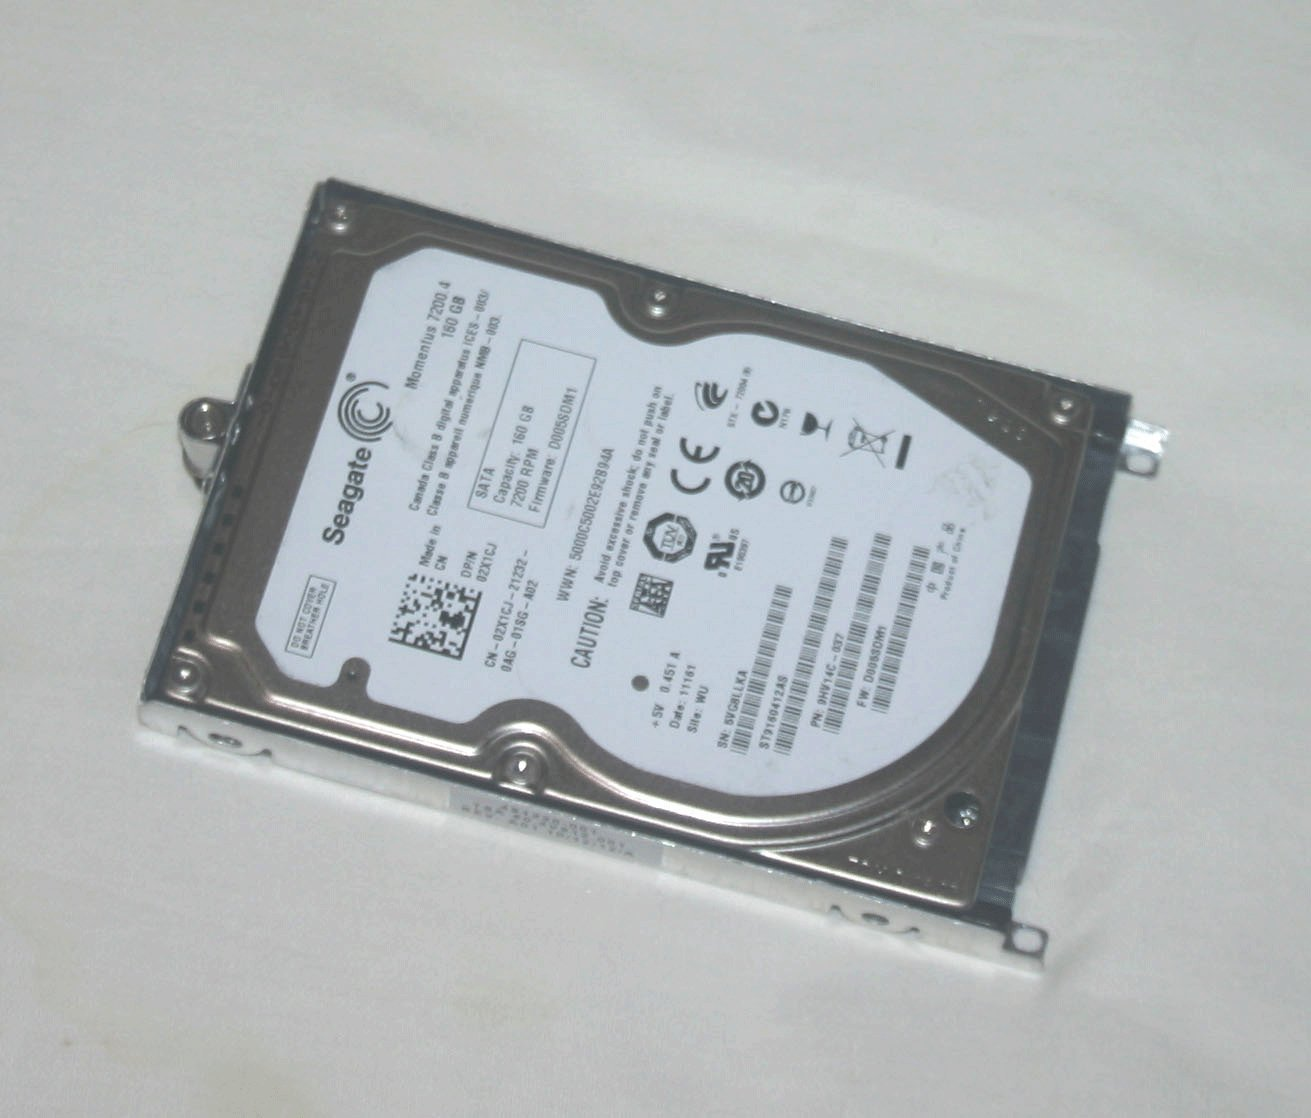 HP Compaq nx6310 Notebook Seagate HDD Driver (2019)